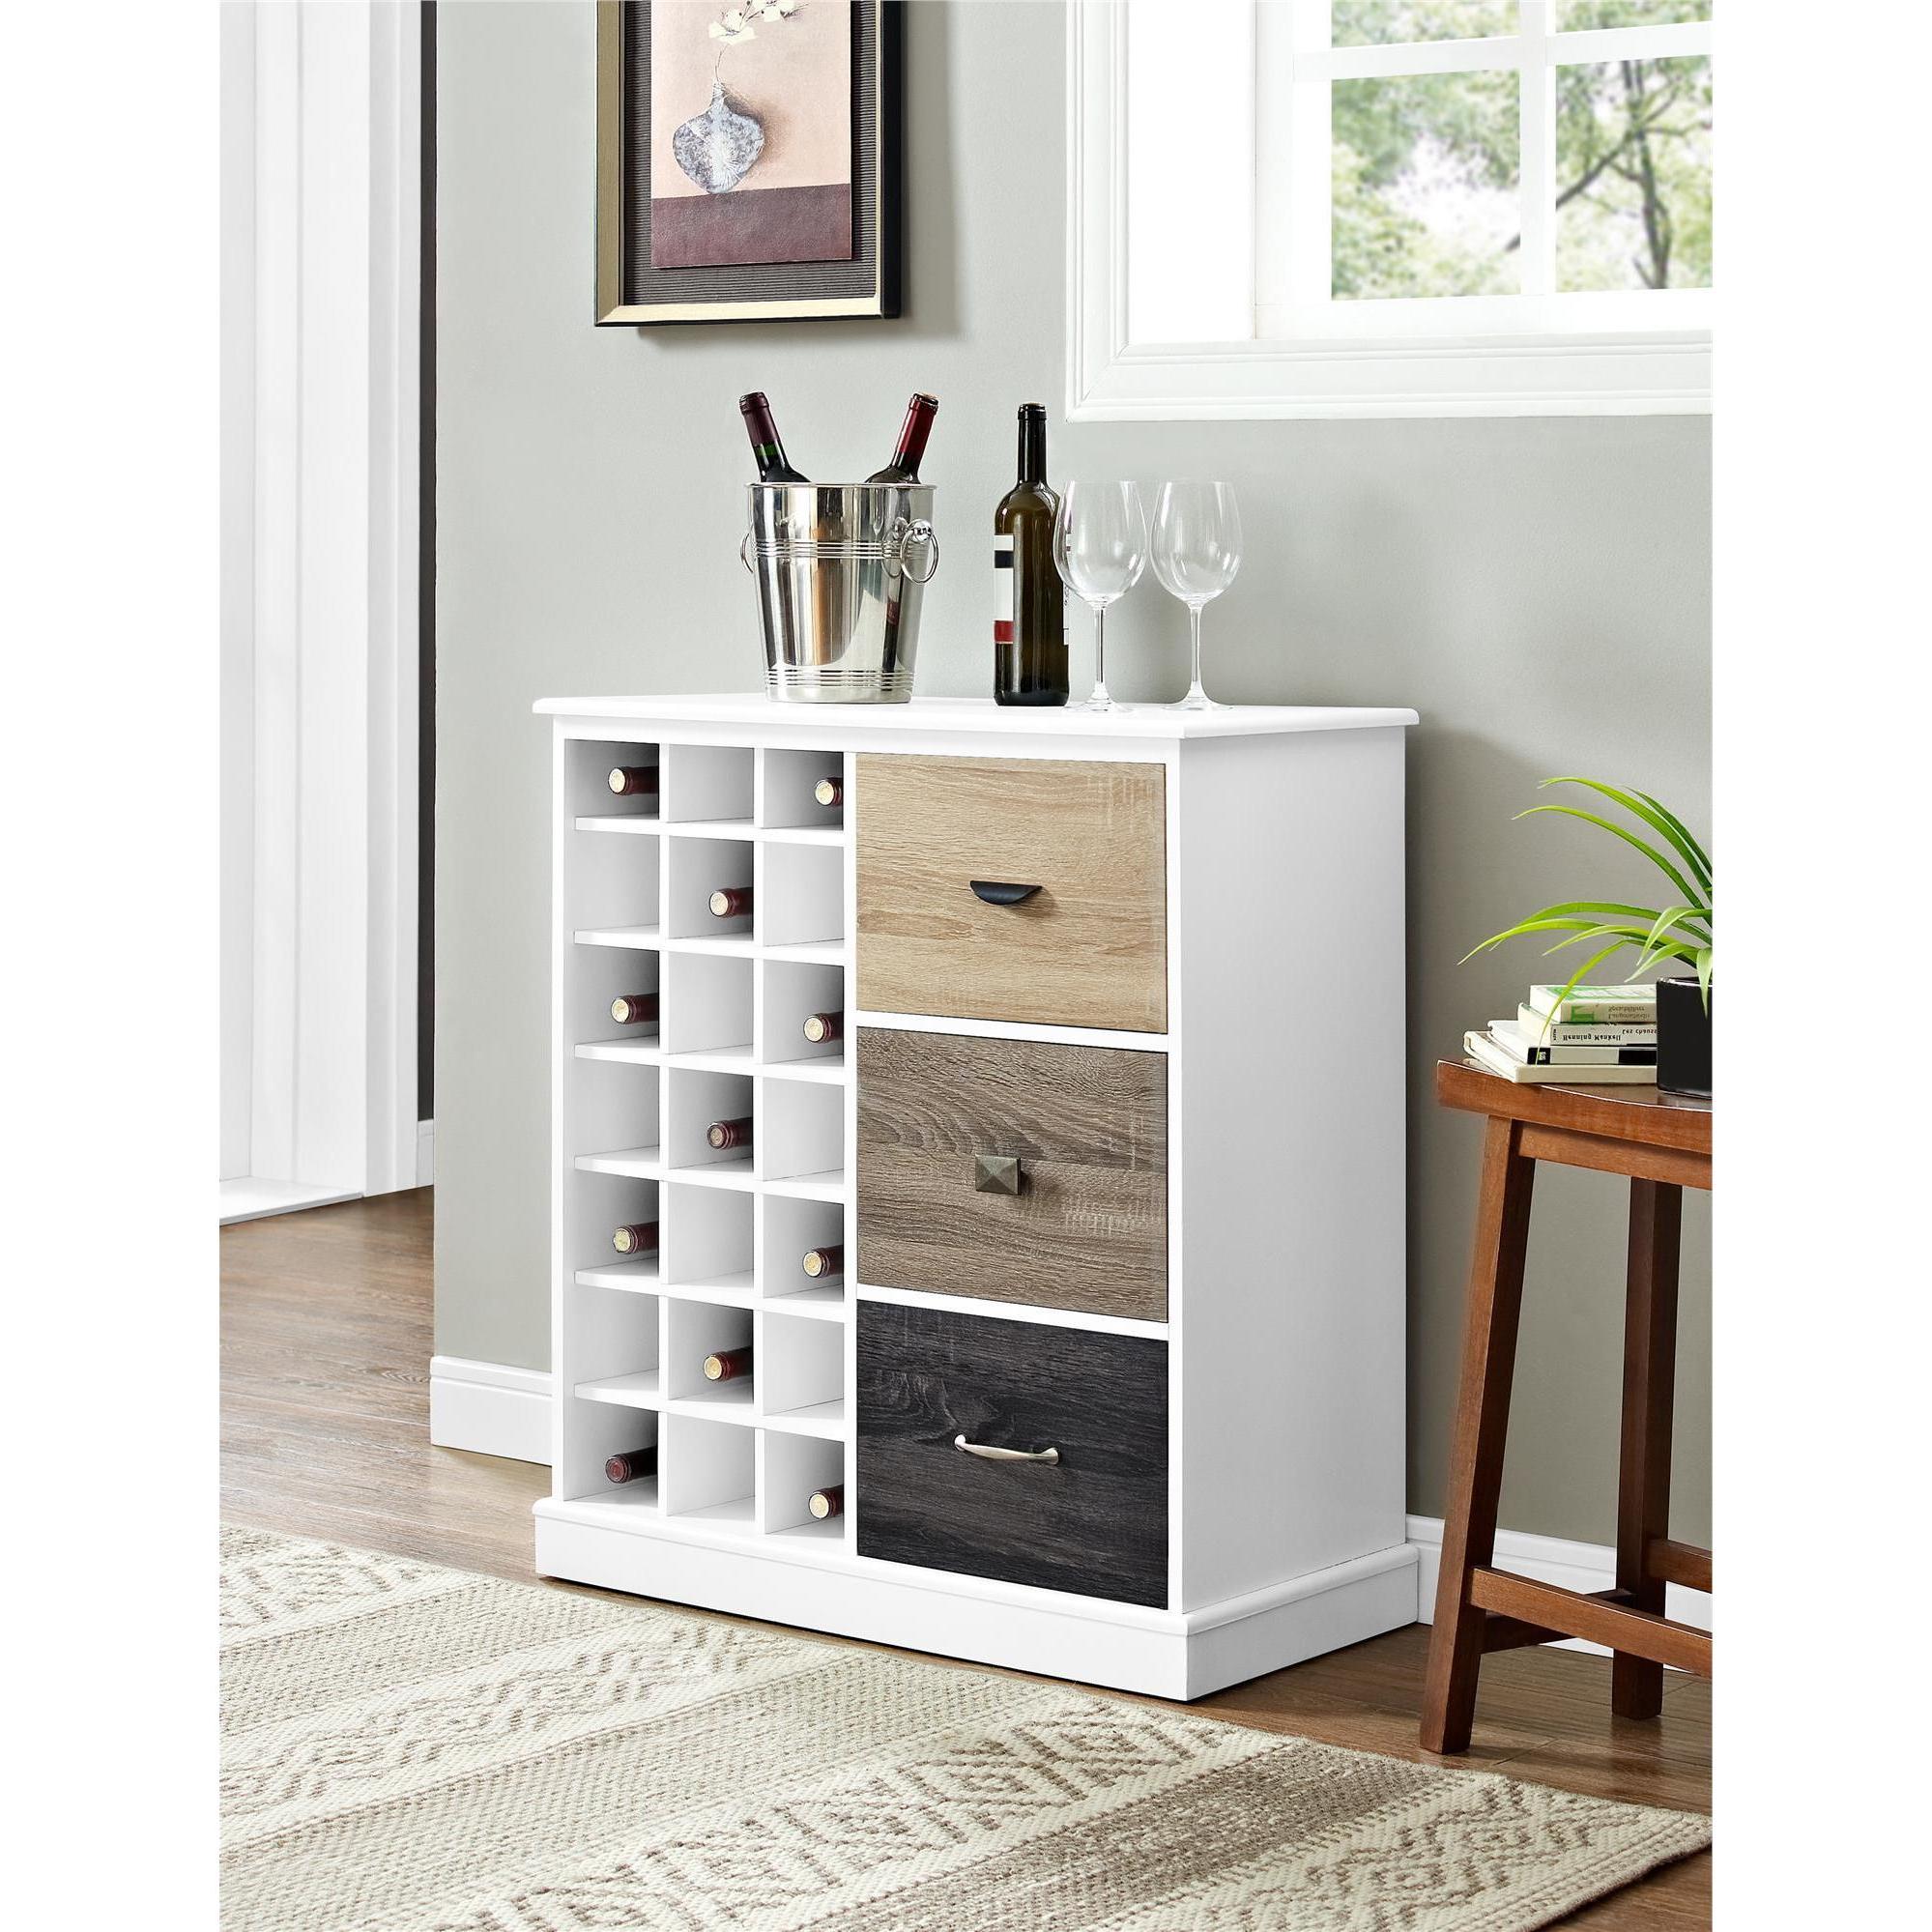 Shop The Gray Barn Latigo White Wine Cabinet With Multicolor Door Throughout Favorite Rani 4 Door Sideboards (View 19 of 20)